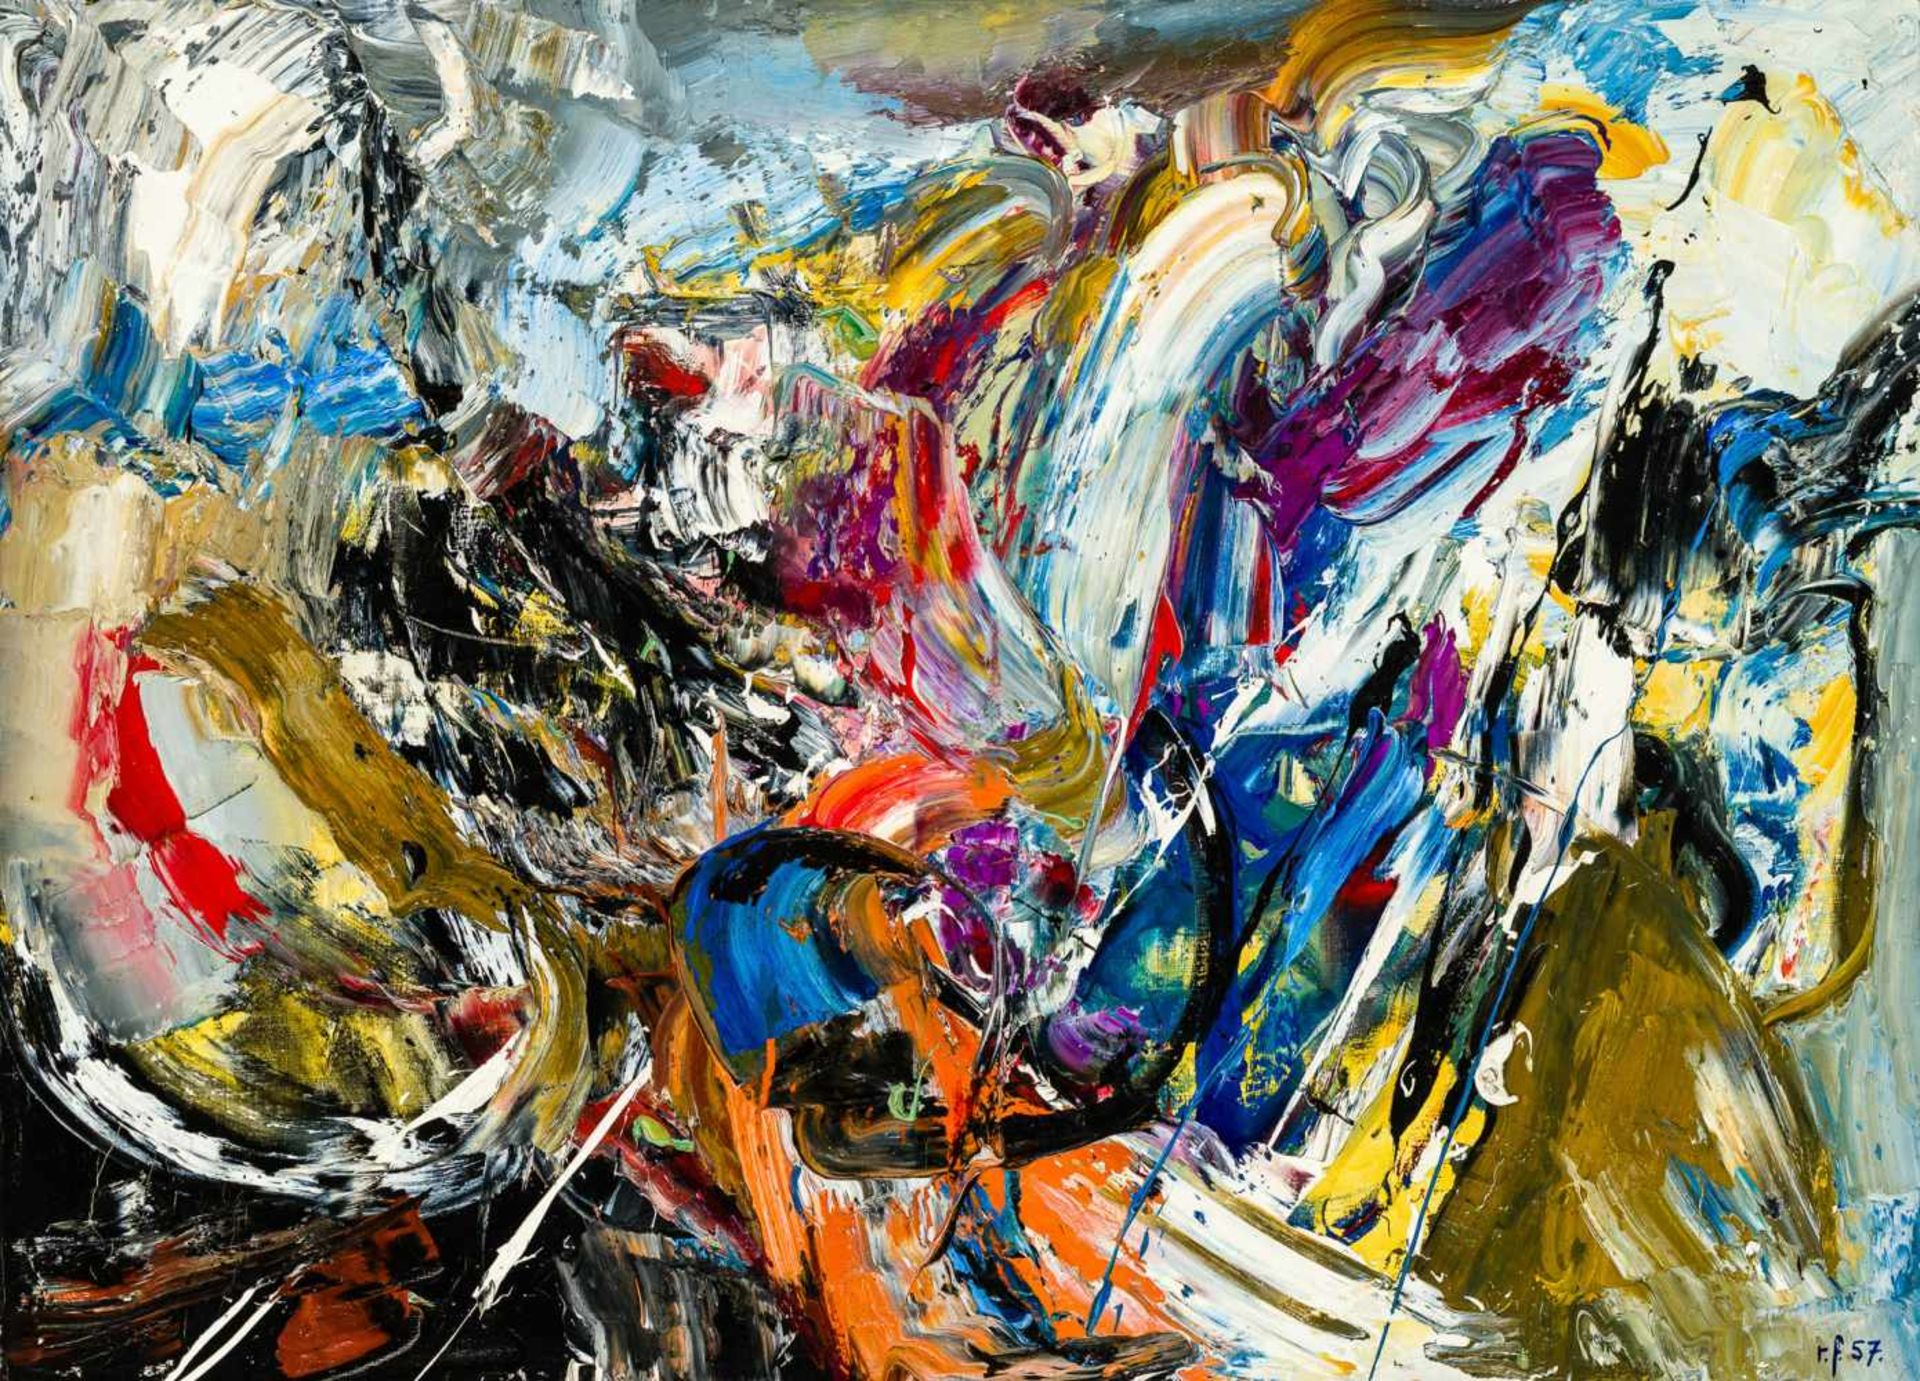 Los 24 - Ruth Francken Prag 1924 - 2006 Paris Petite Vallee De Blake Öl auf Leinwand 73 x 101 cm 1957